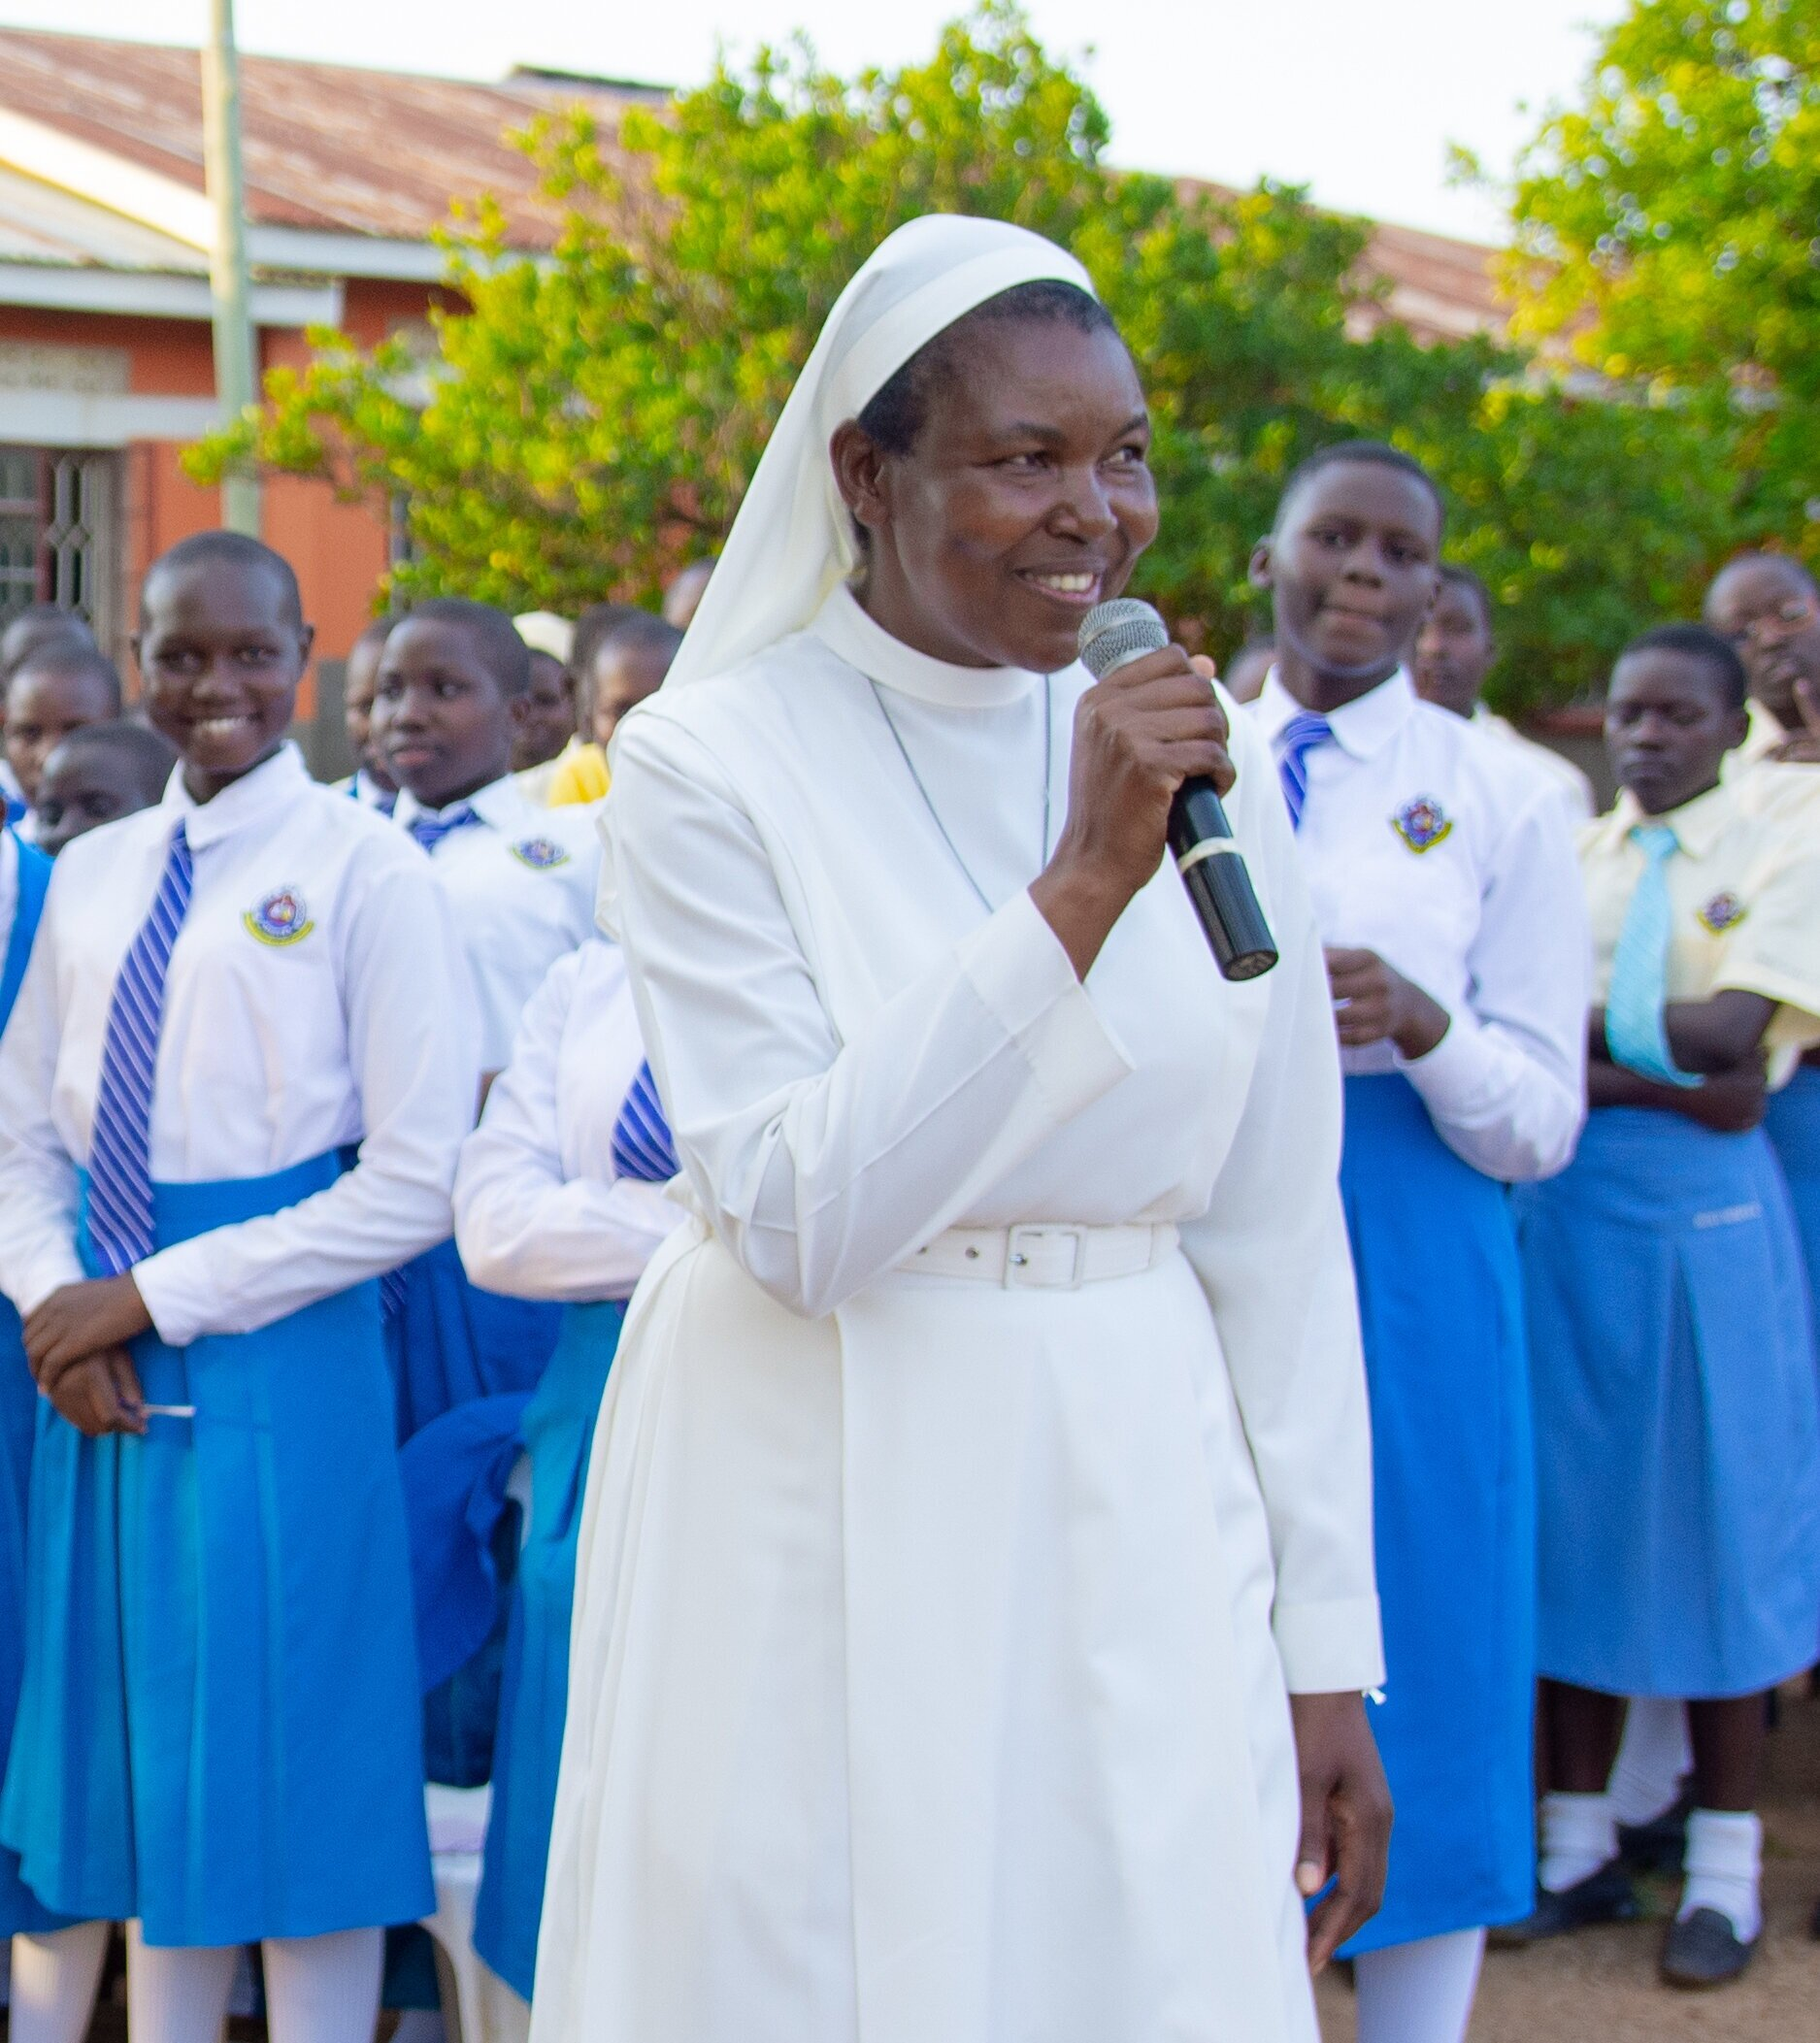 Sr. Salome, St. Mary's Girls' Secondary School